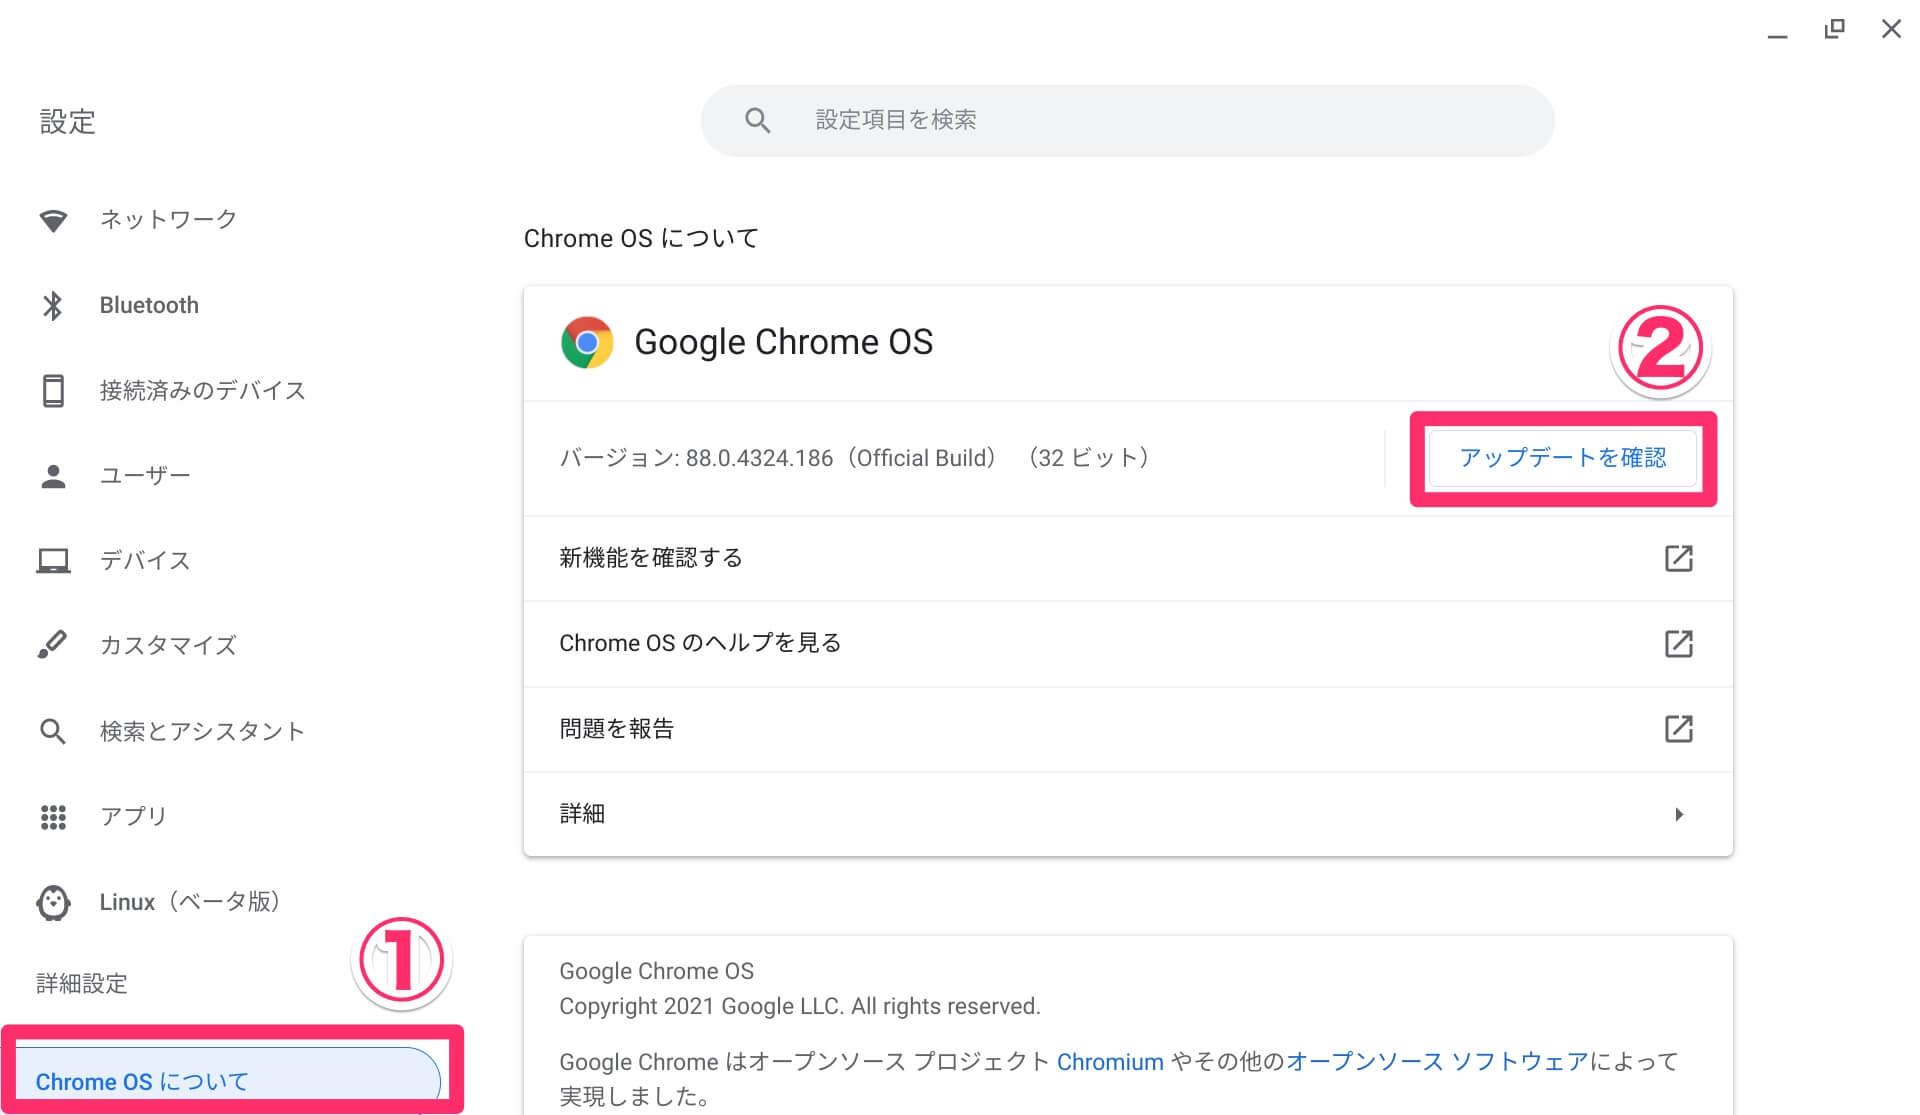 Chrome OSを手動でアップデートする方法。Chromebookを今すぐ最新版に!